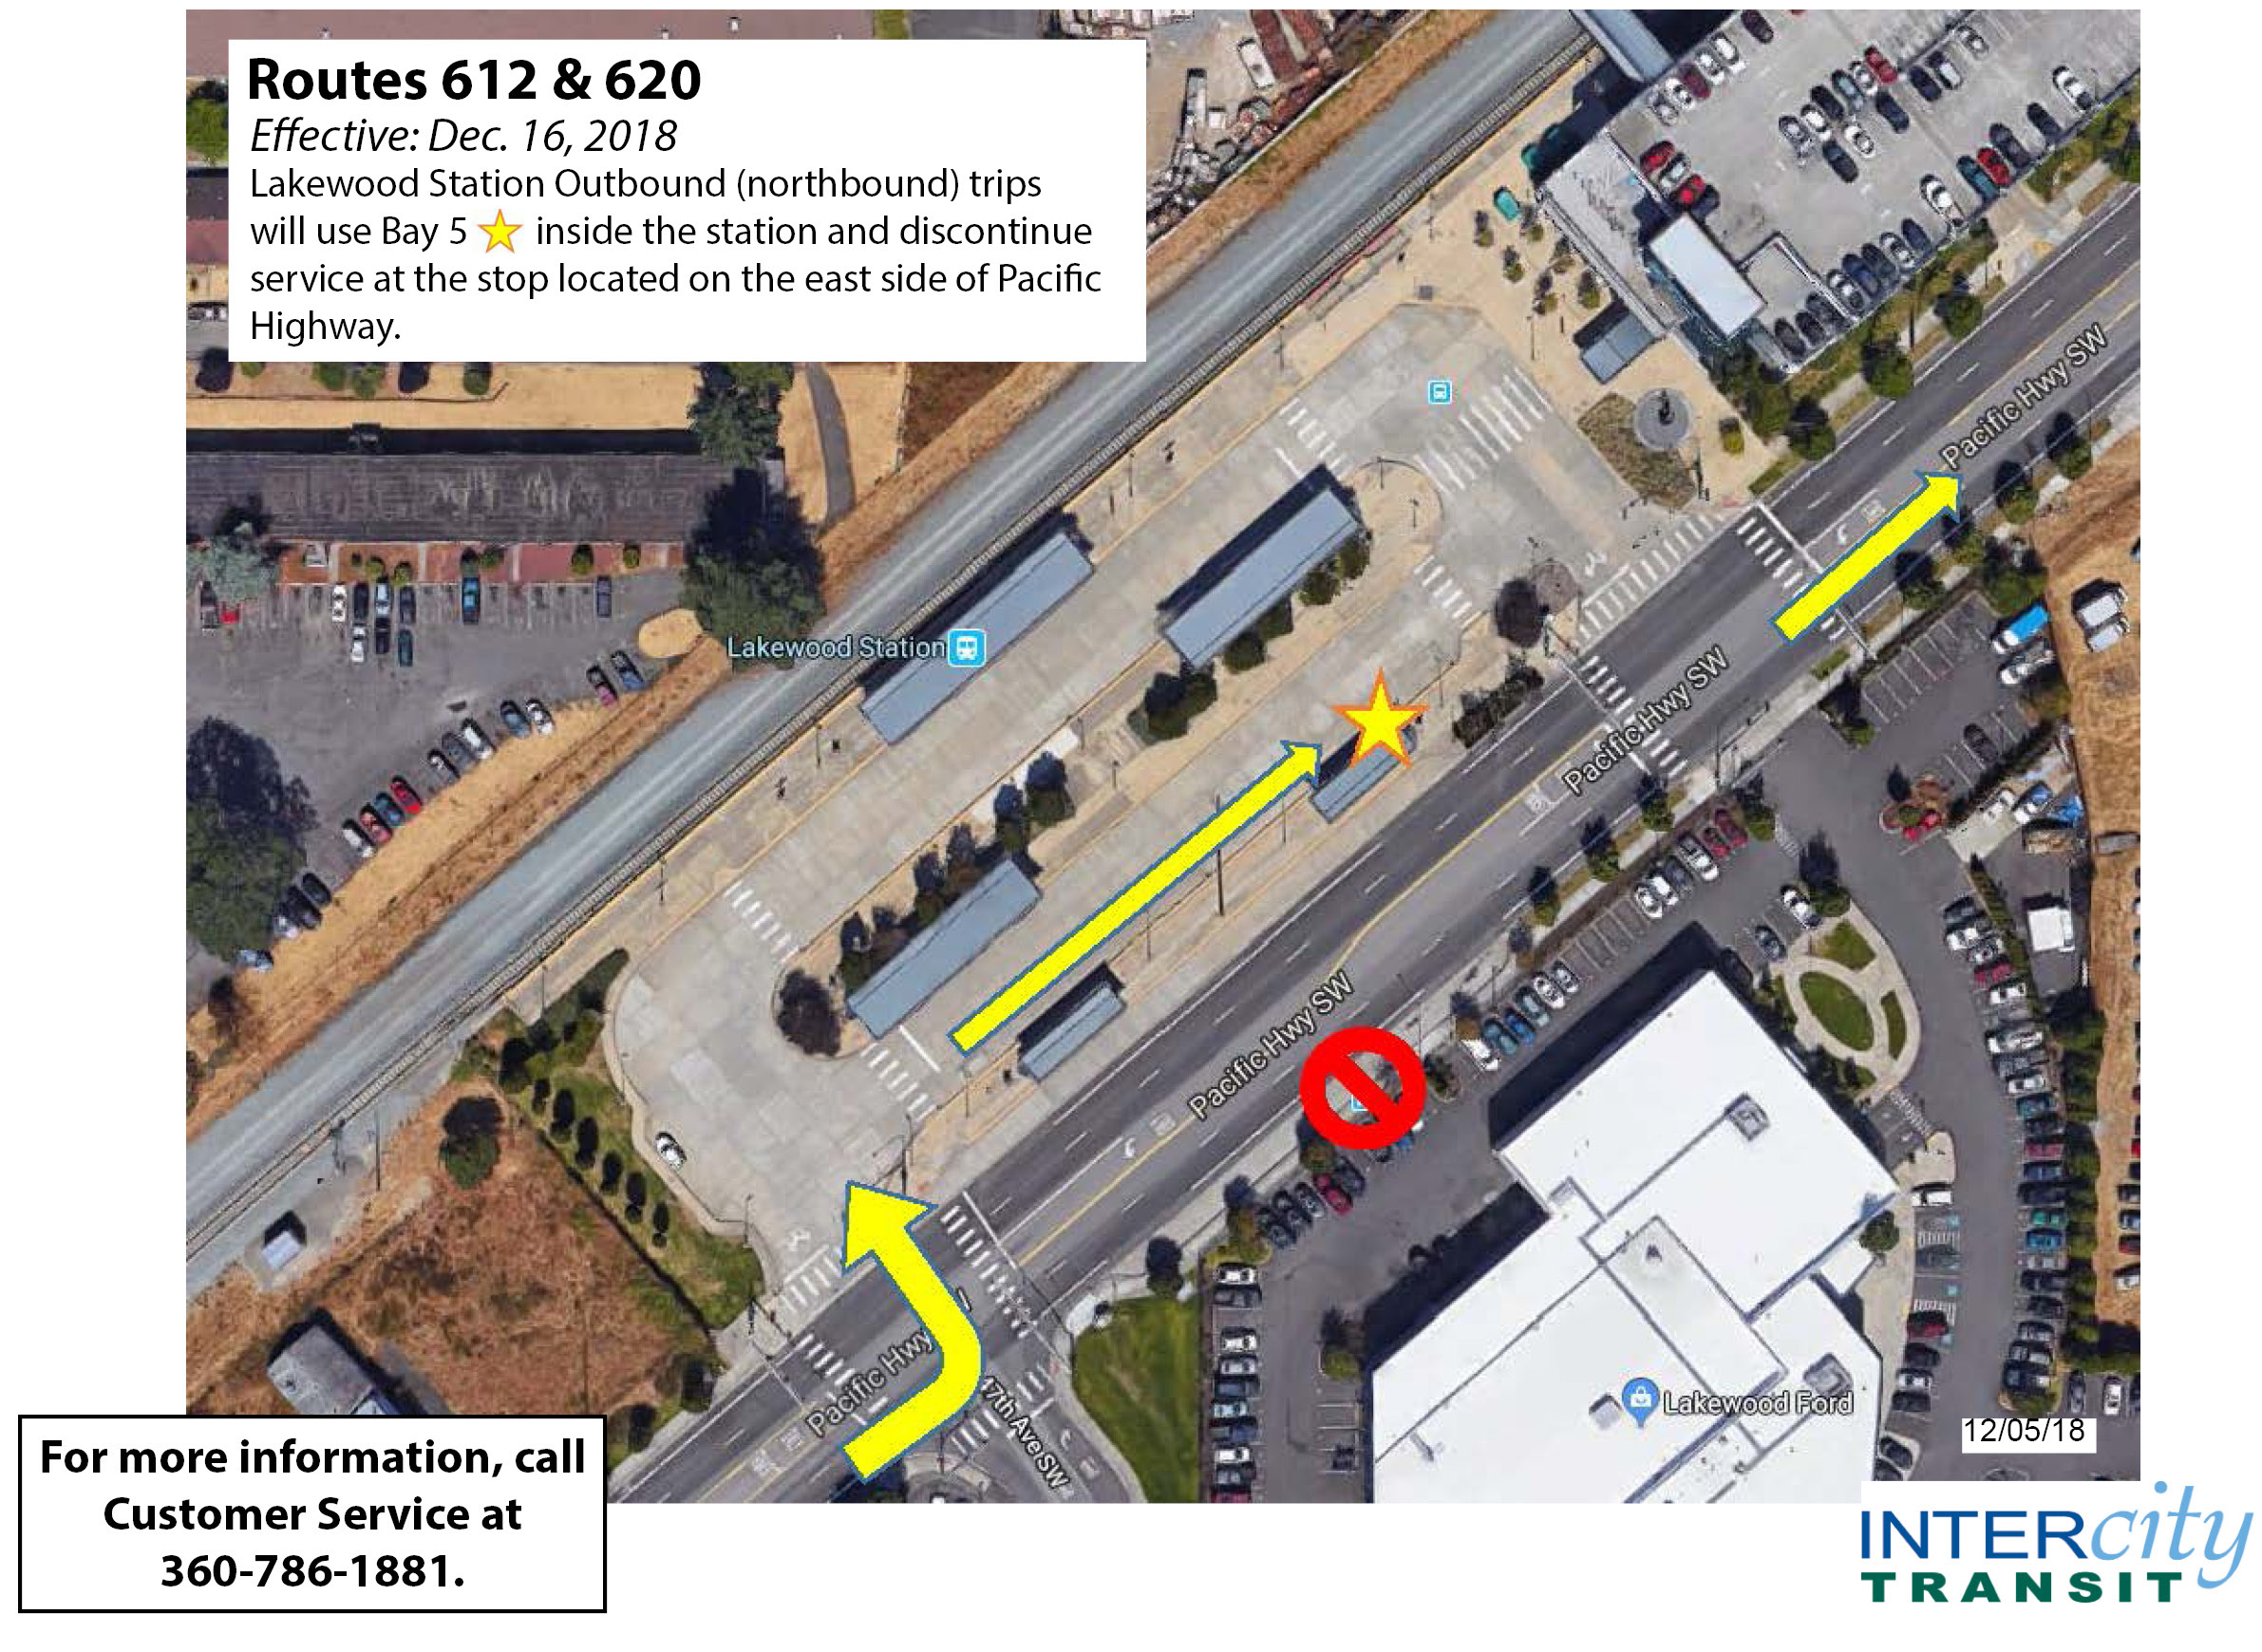 612 | intercity transit